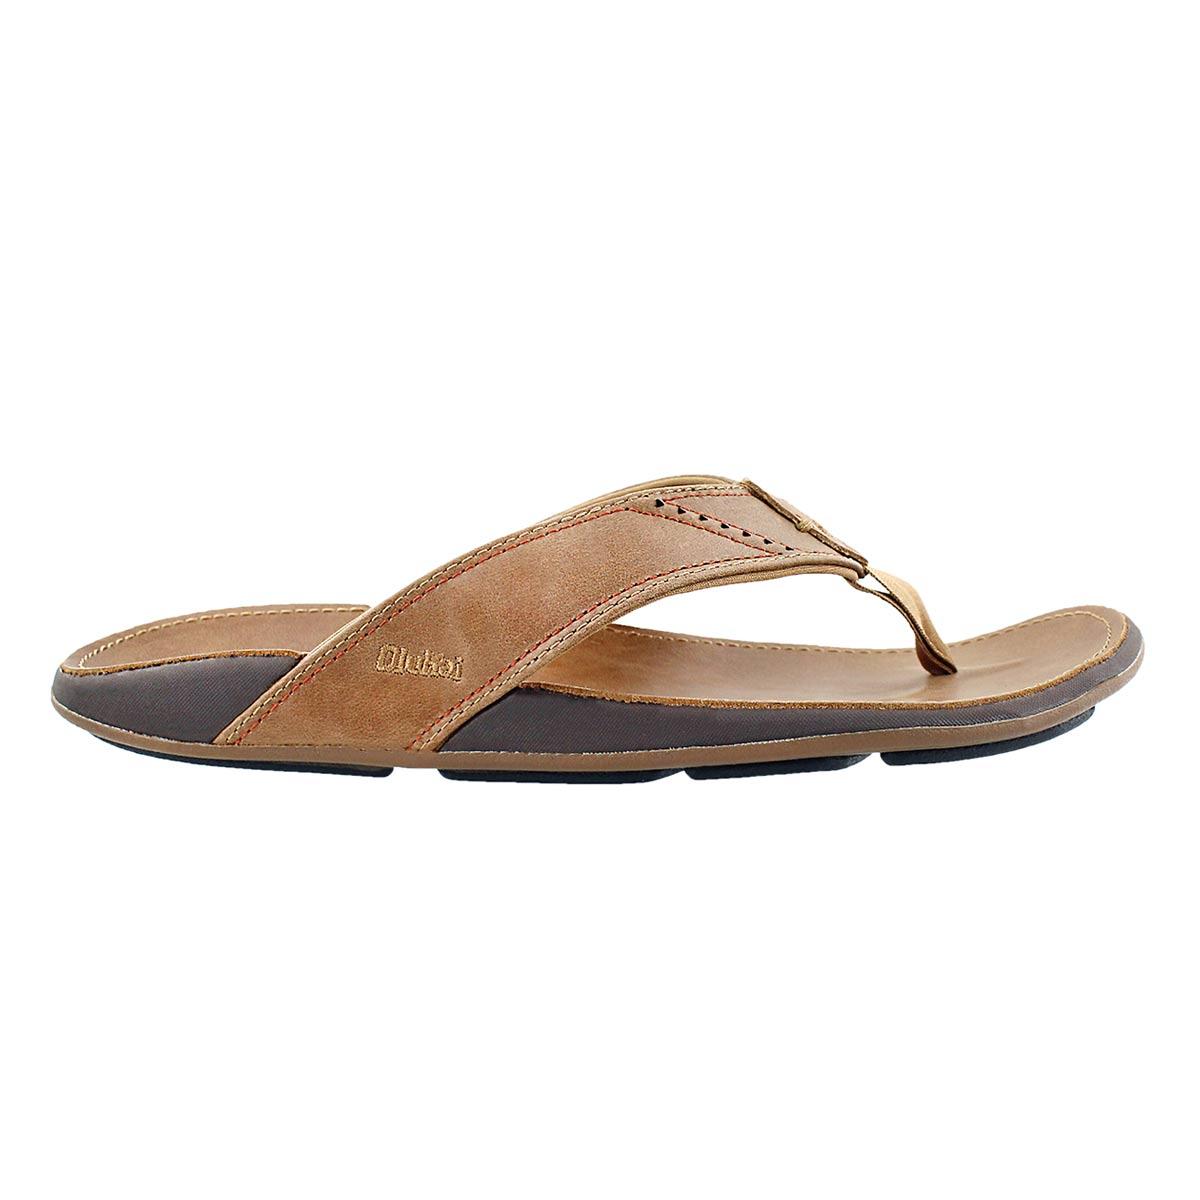 Mns Nui tan thong sandal